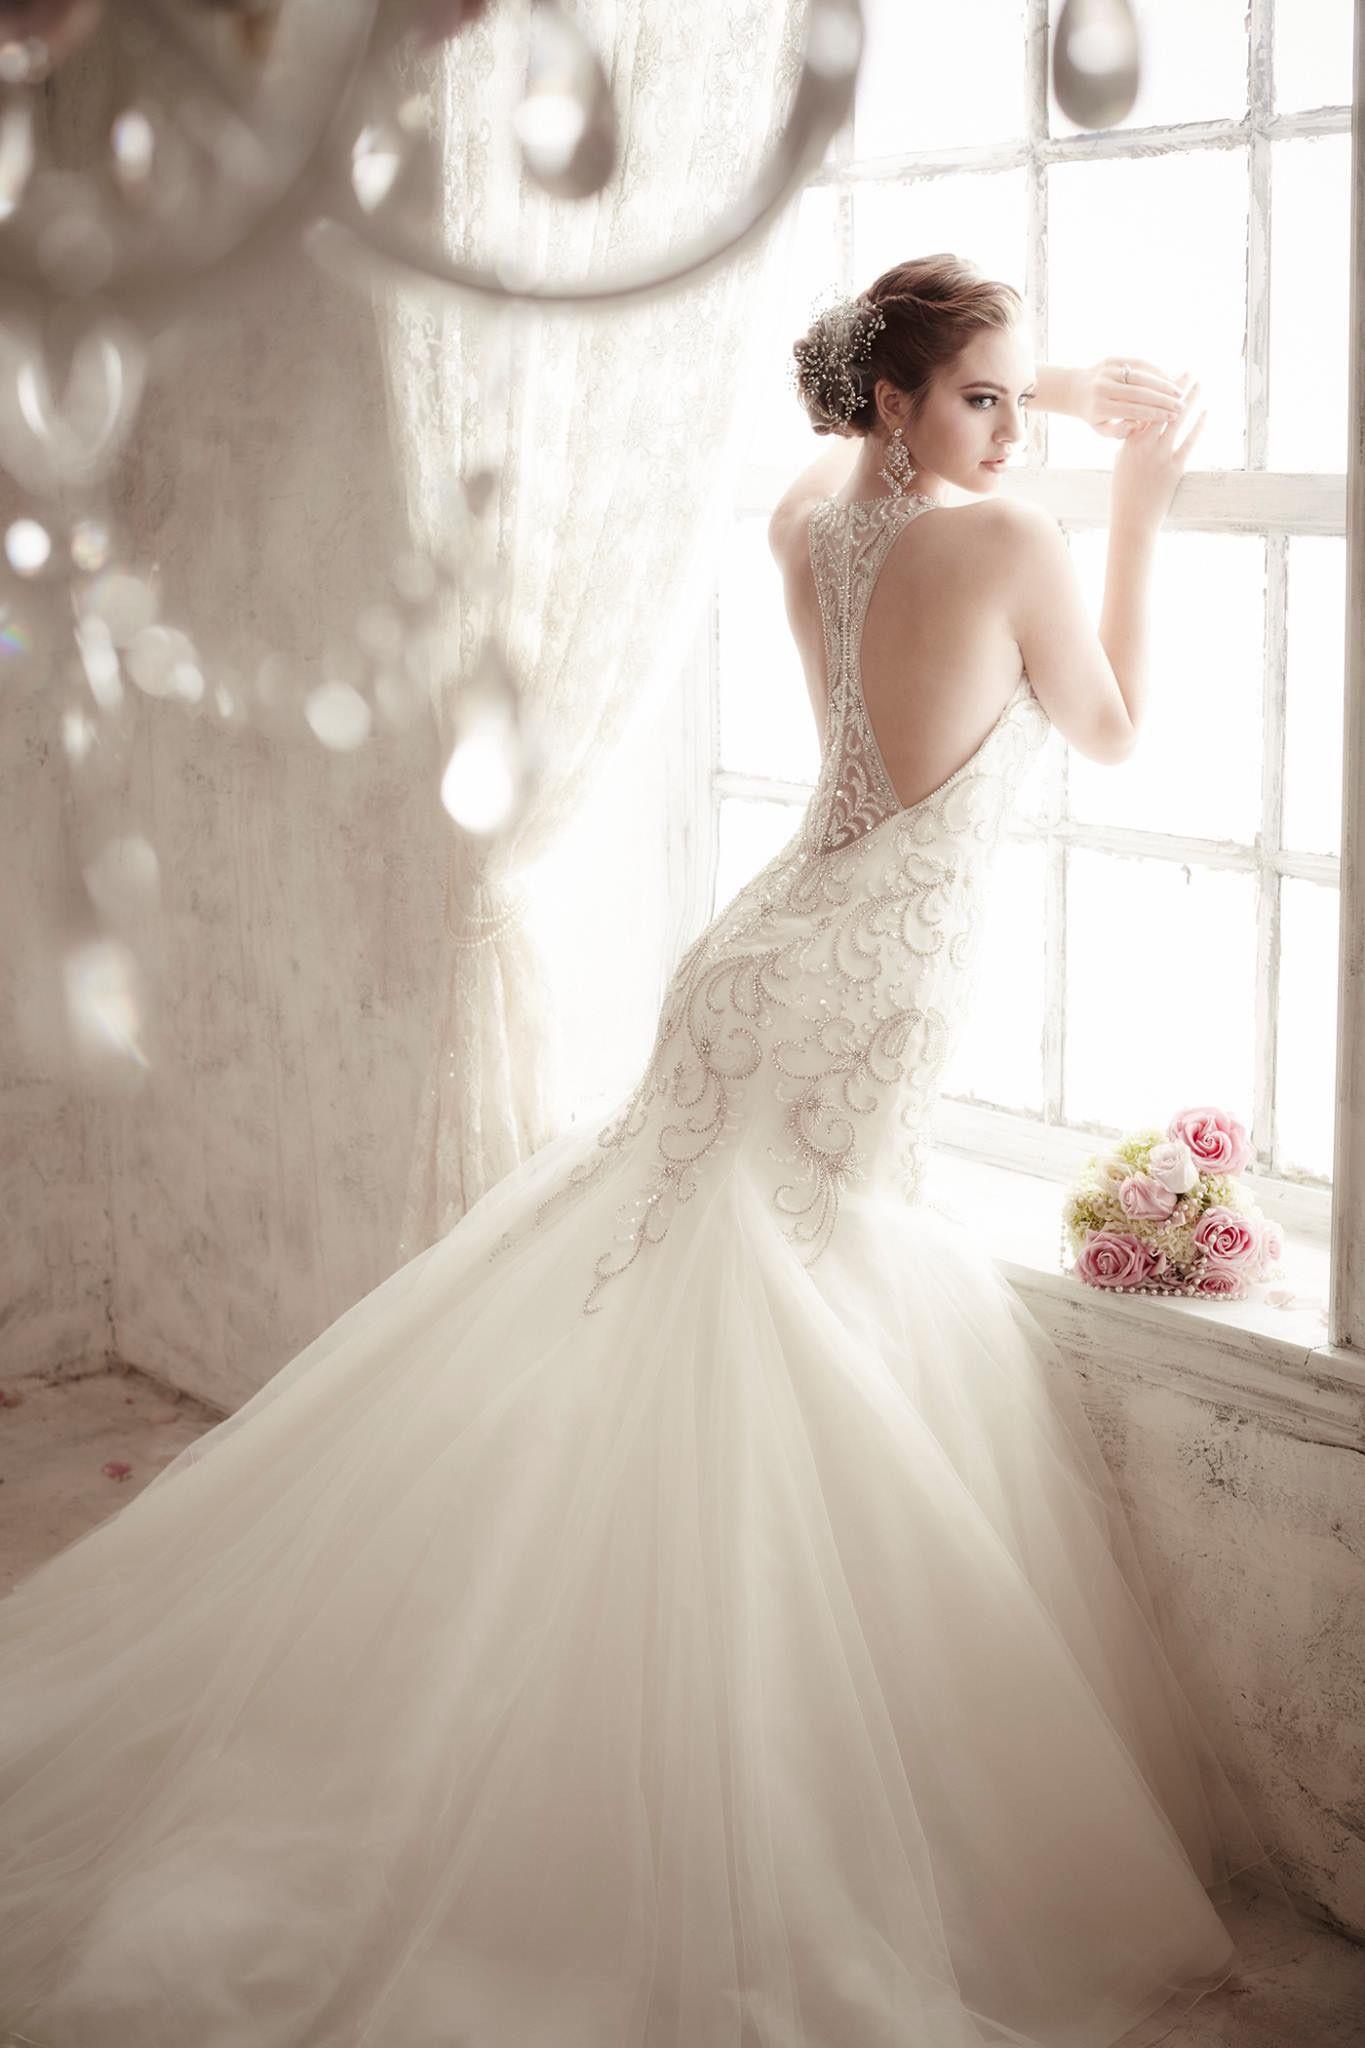 Rent wedding dress davids bridal  Pin by Sophie Thorn on The Wedding Dresses  Pinterest  Wedding